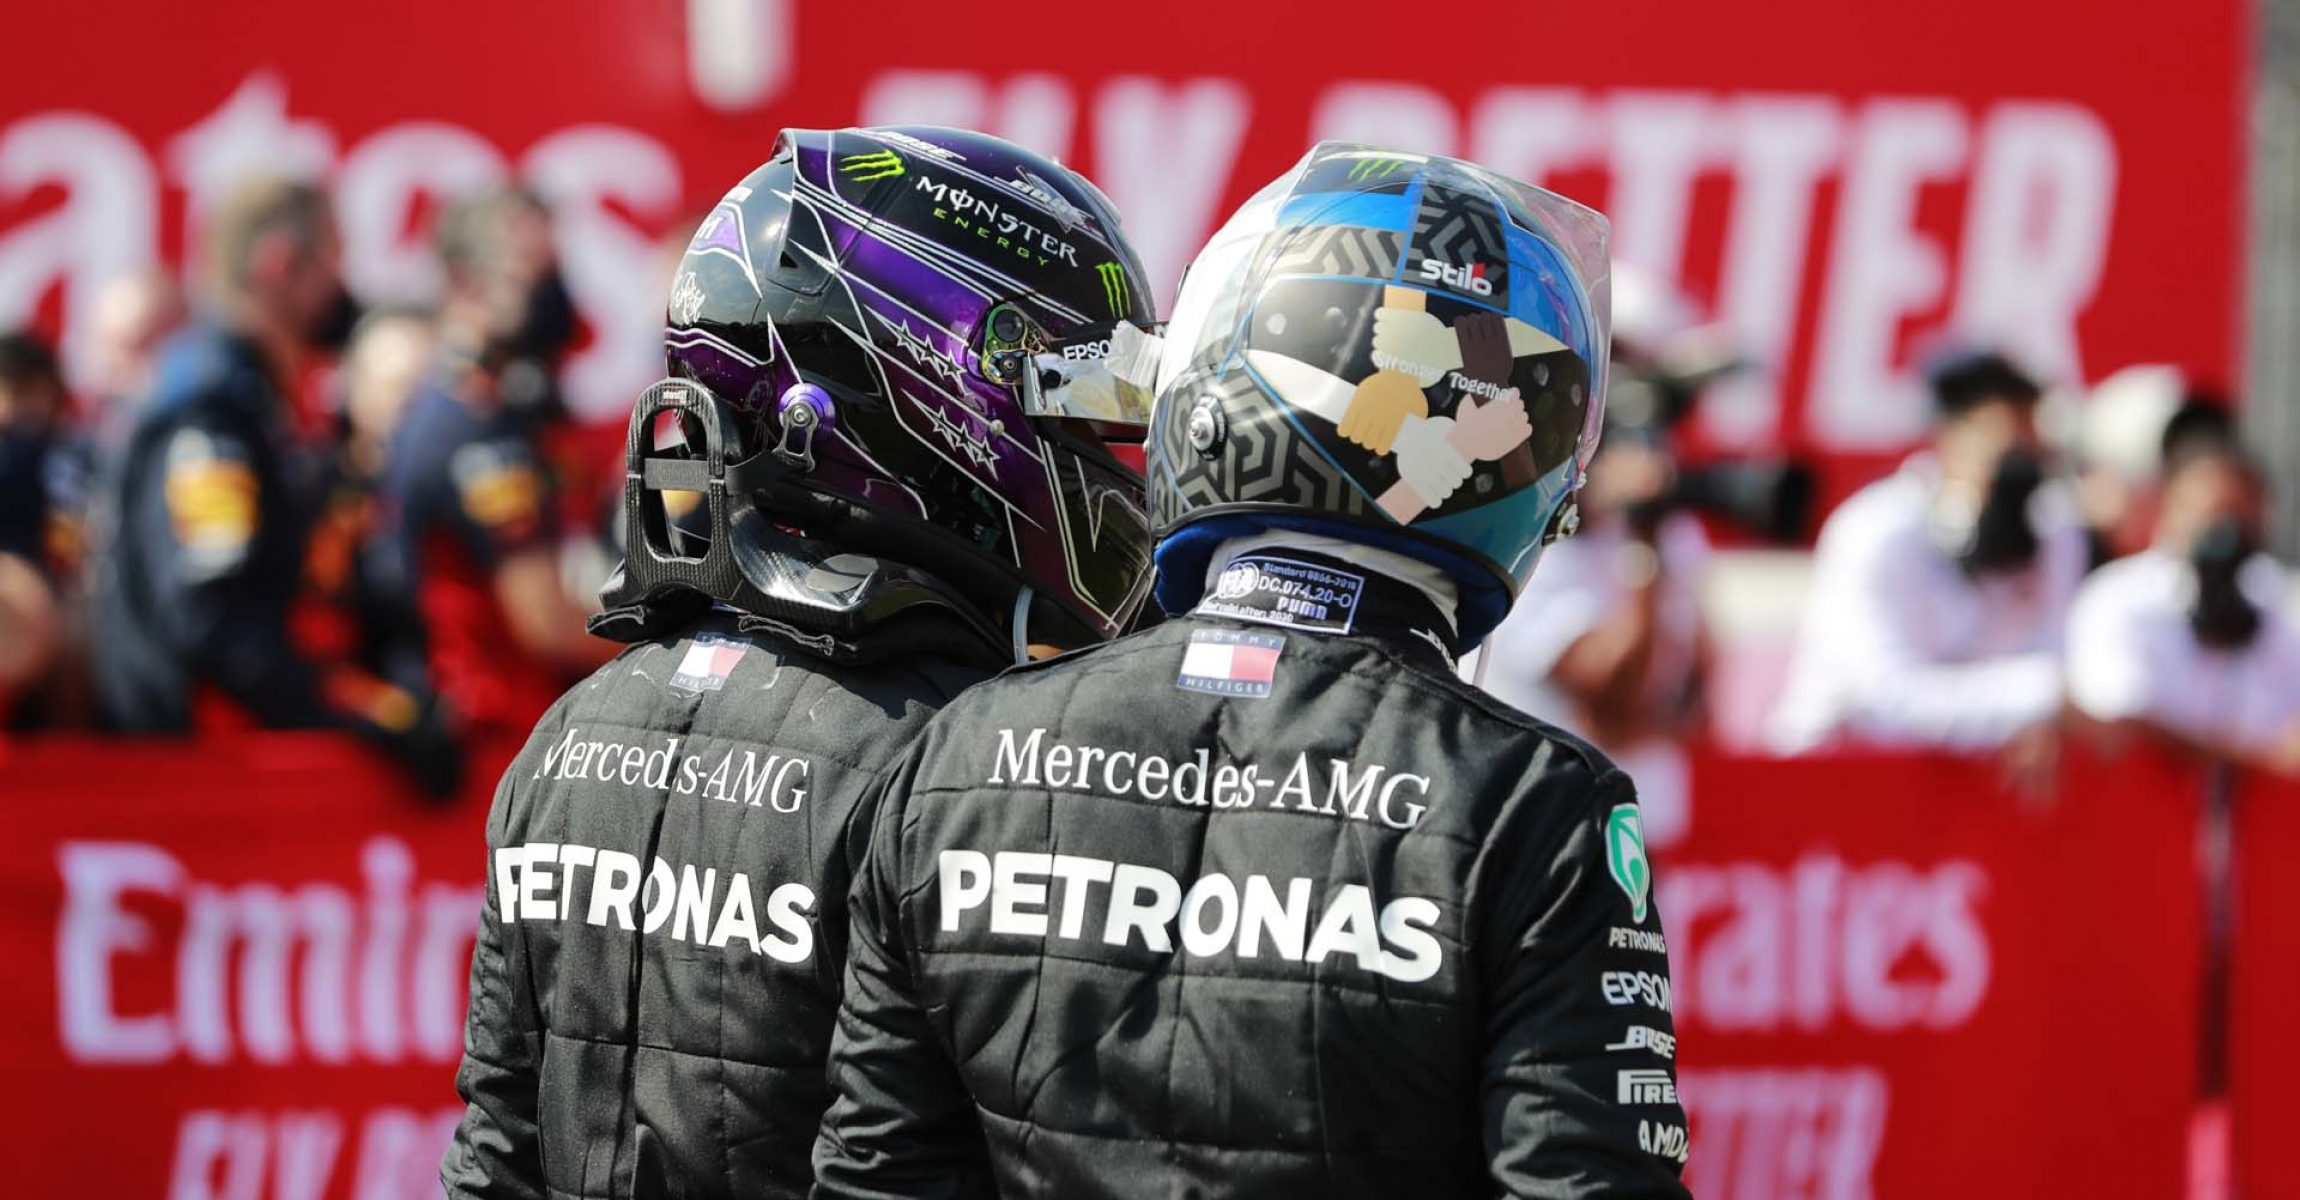 2020 70th Anniversary Grand Prix, Sunday - LAT Images Valtteri Bottas Mercedes Lewis Hamilton